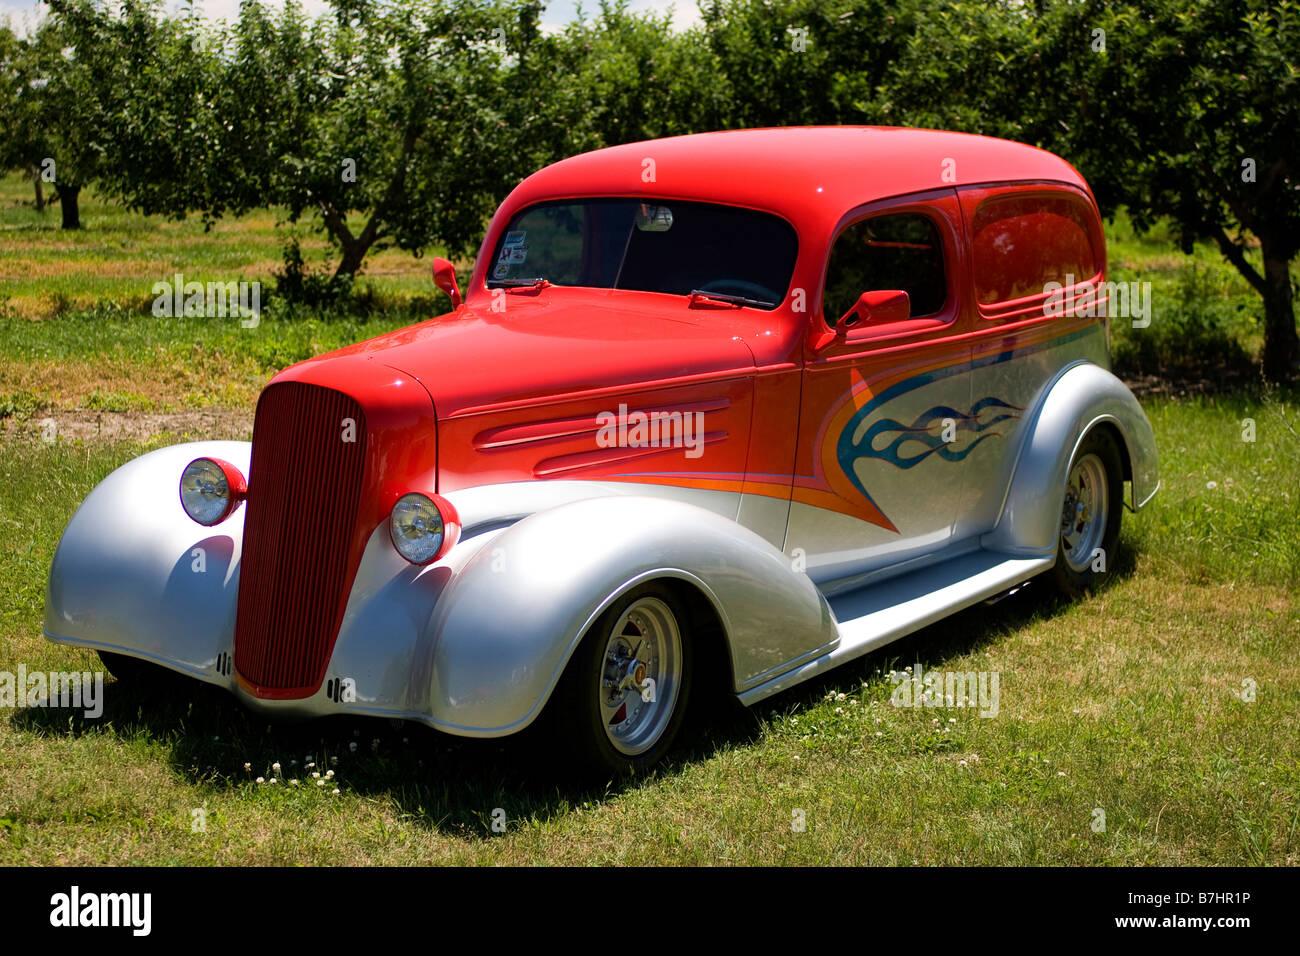 1936 Automobile Stock Photos & 1936 Automobile Stock Images